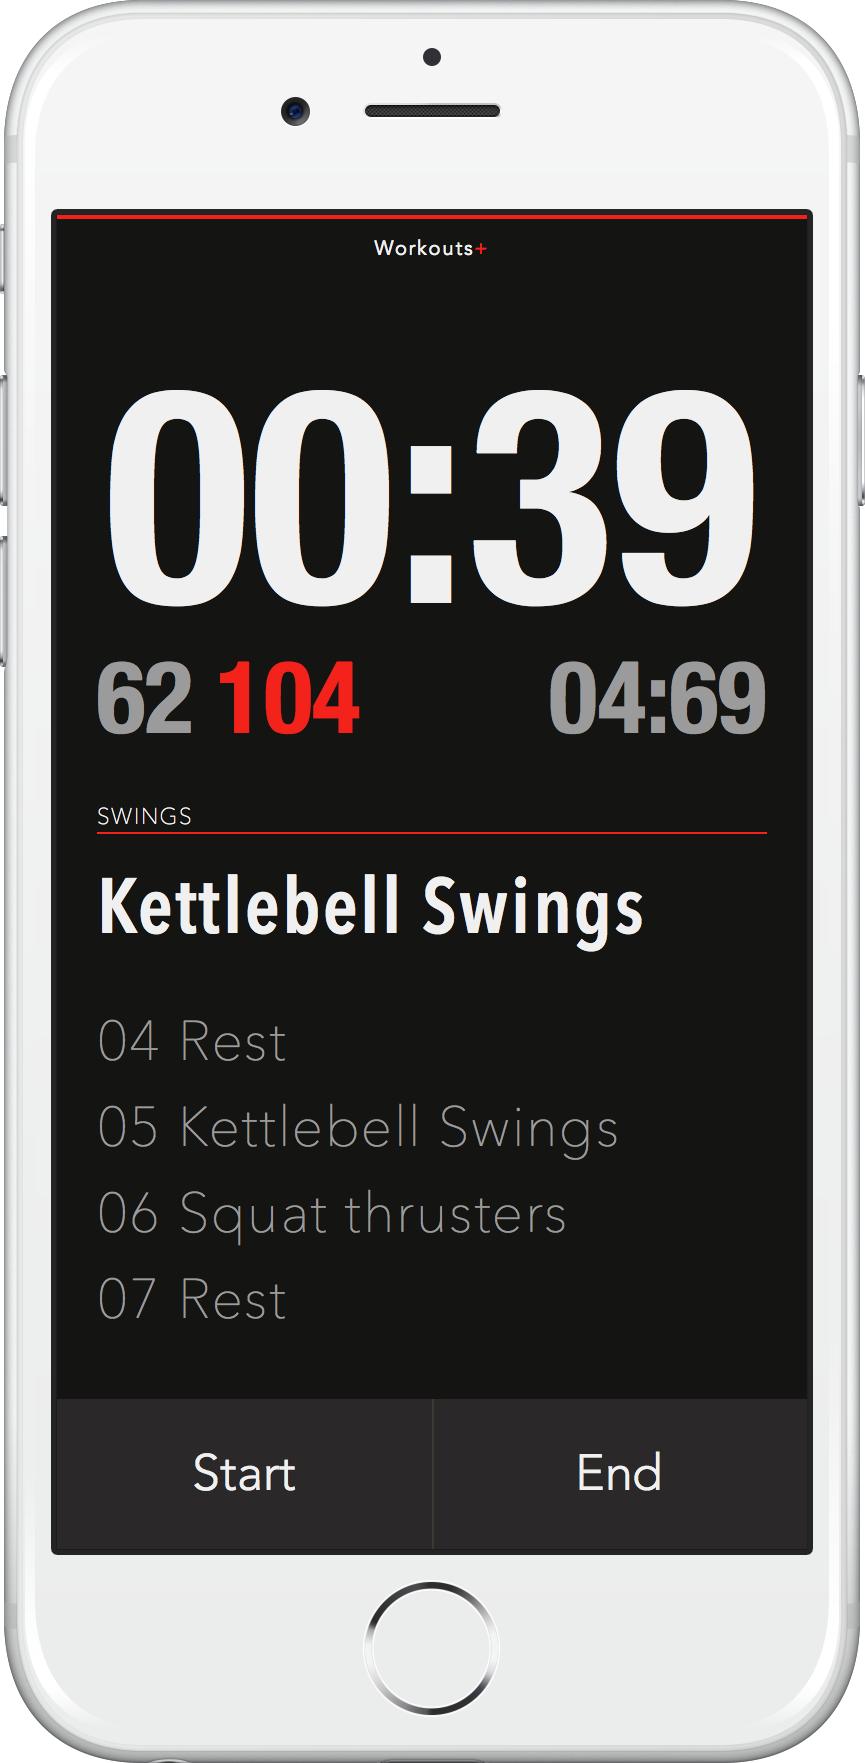 Intervals+ Interval Timer app for iOS